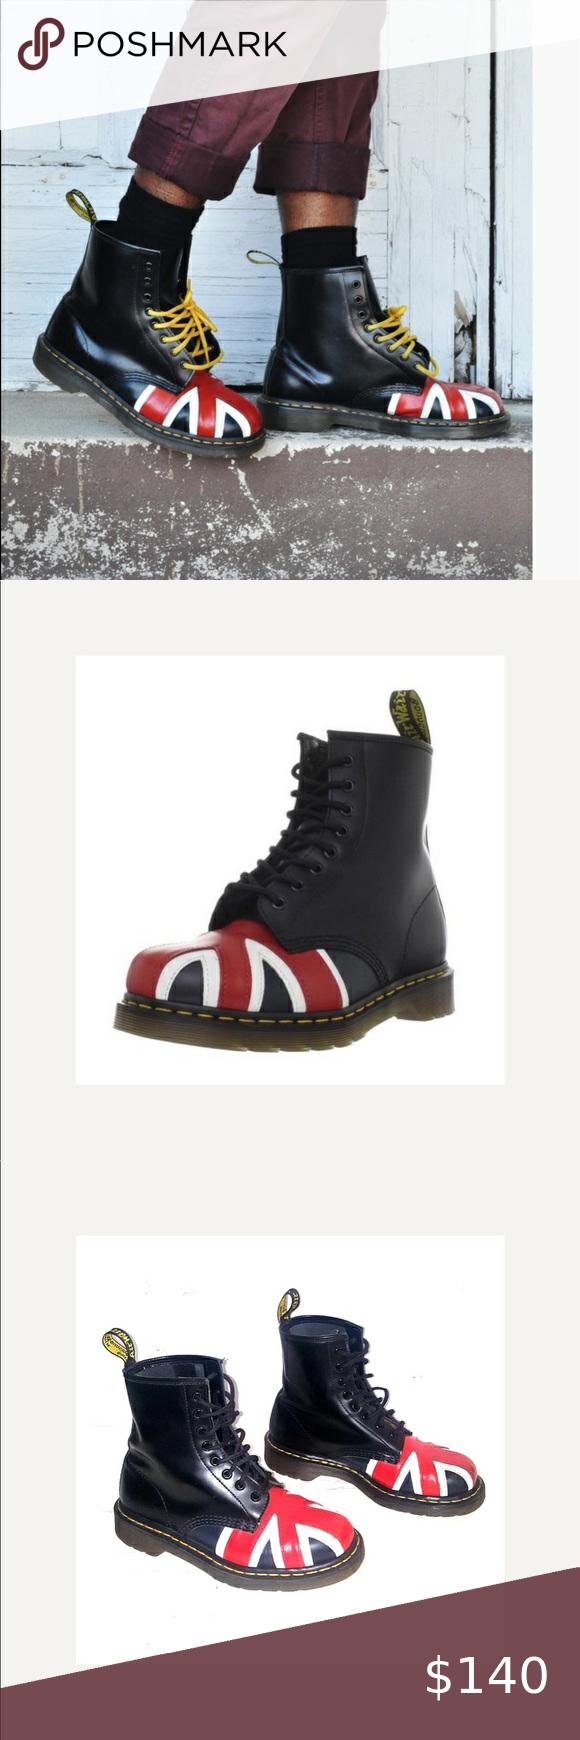 Leather High Top Sneakers Модная обувь и Обувь